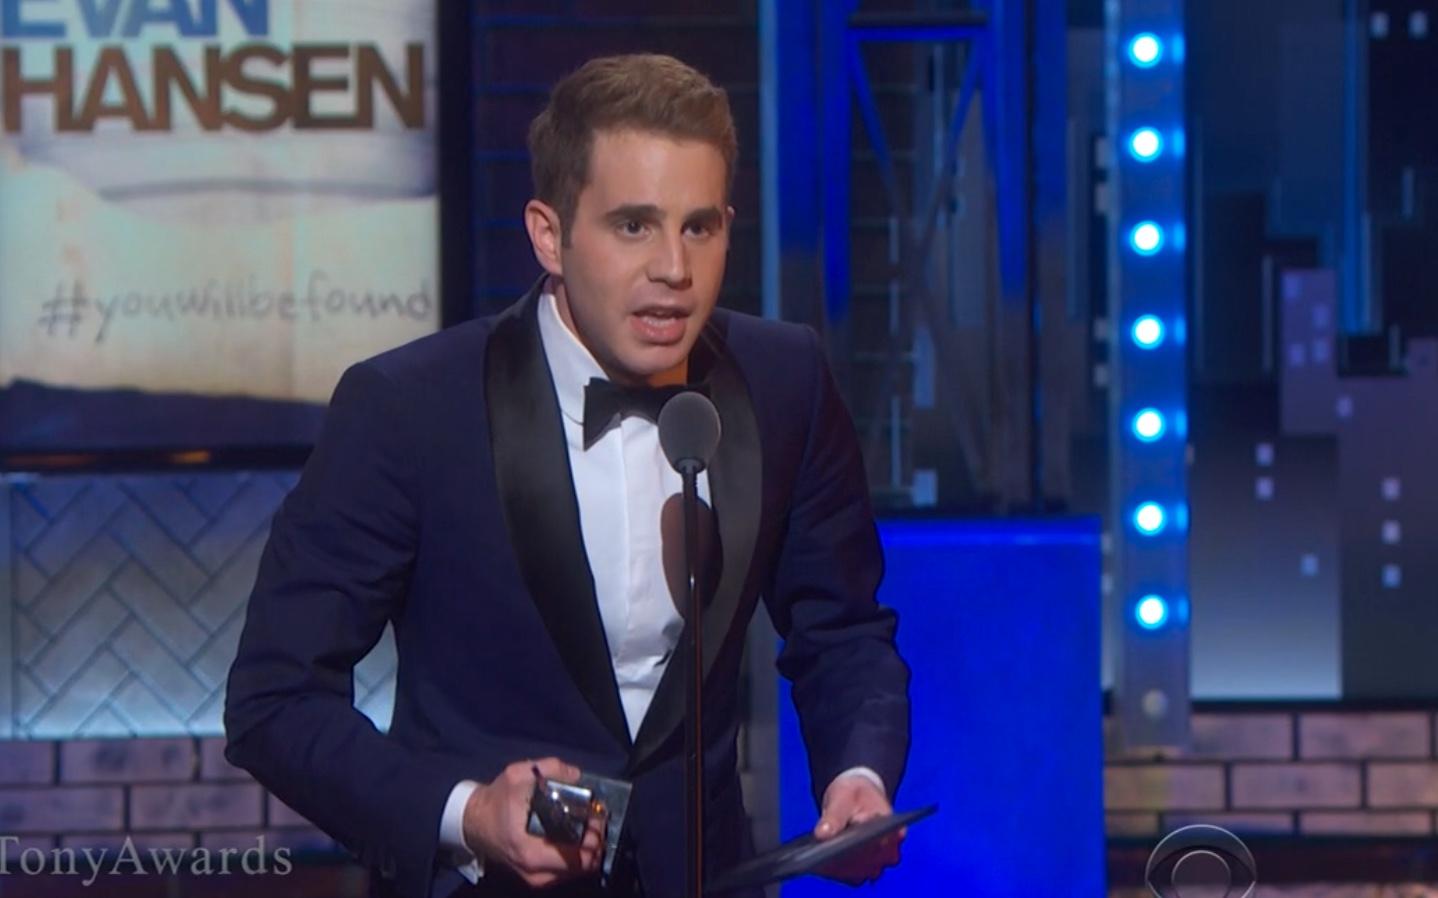 Ben Platt accepting his award as Best Actor in a musical, in a speech that seemed to reintroduce the concept of 78 rpm